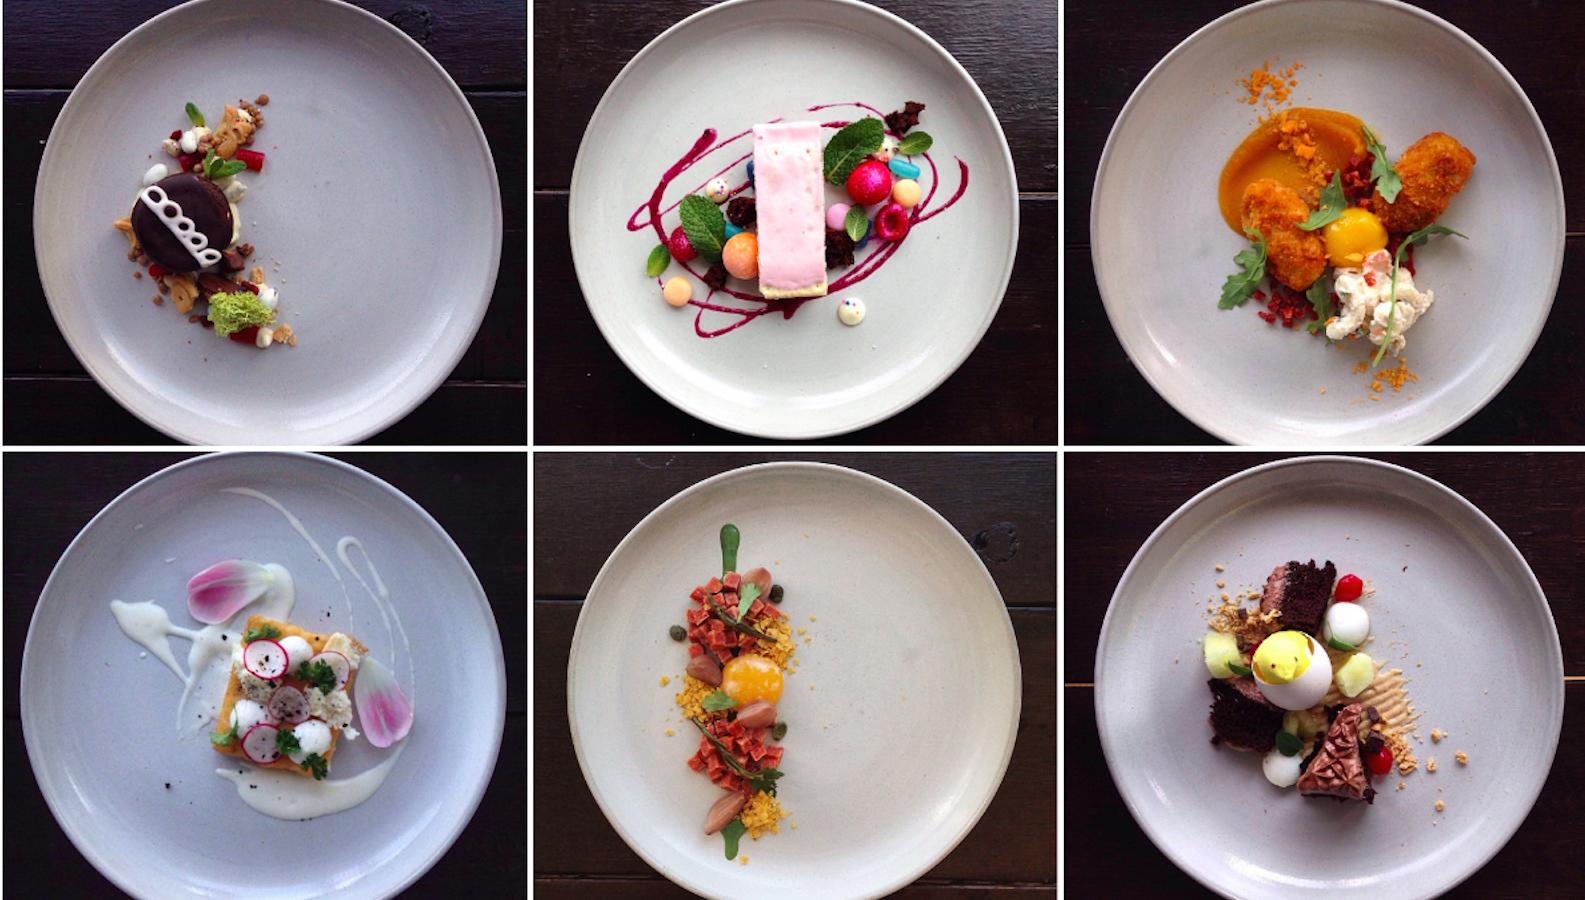 Photos Instagram Chef Parodies Michelin Style Plating